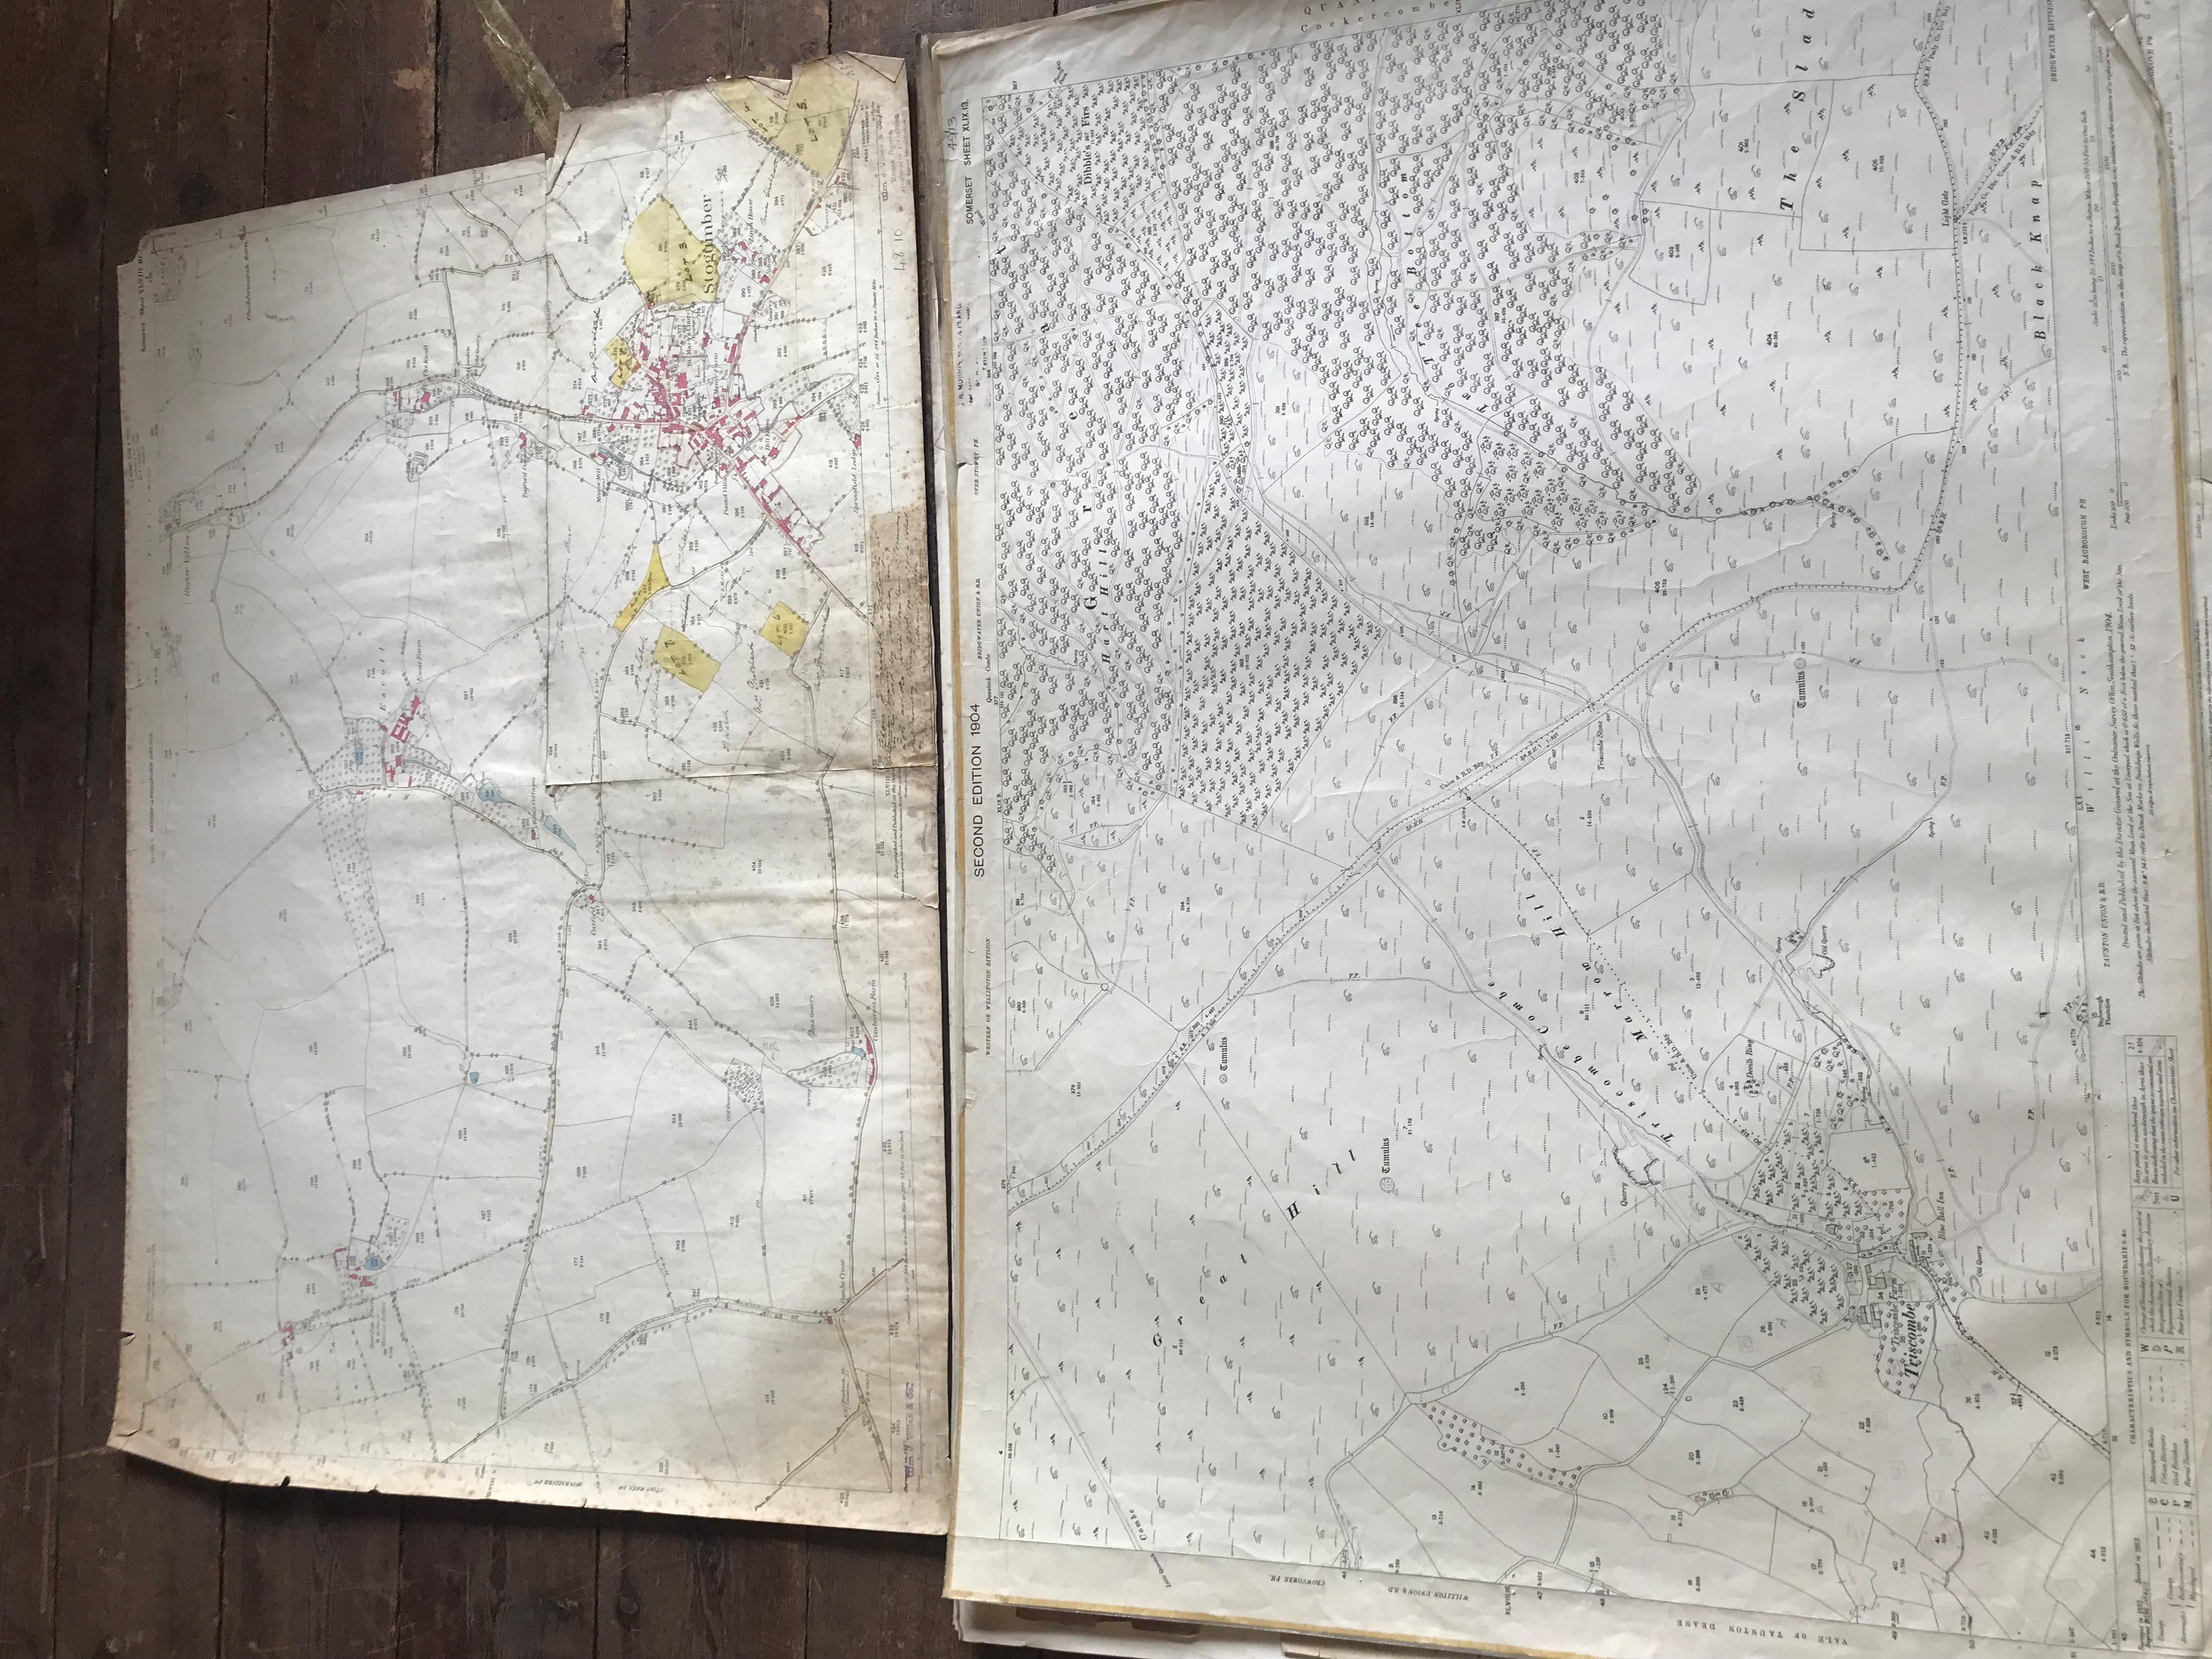 THIRTY 1:2500 ORDNANCE SURVEY MAPS featuring Chelston, Ham, Sampford Brett, Wellington, - Image 13 of 16